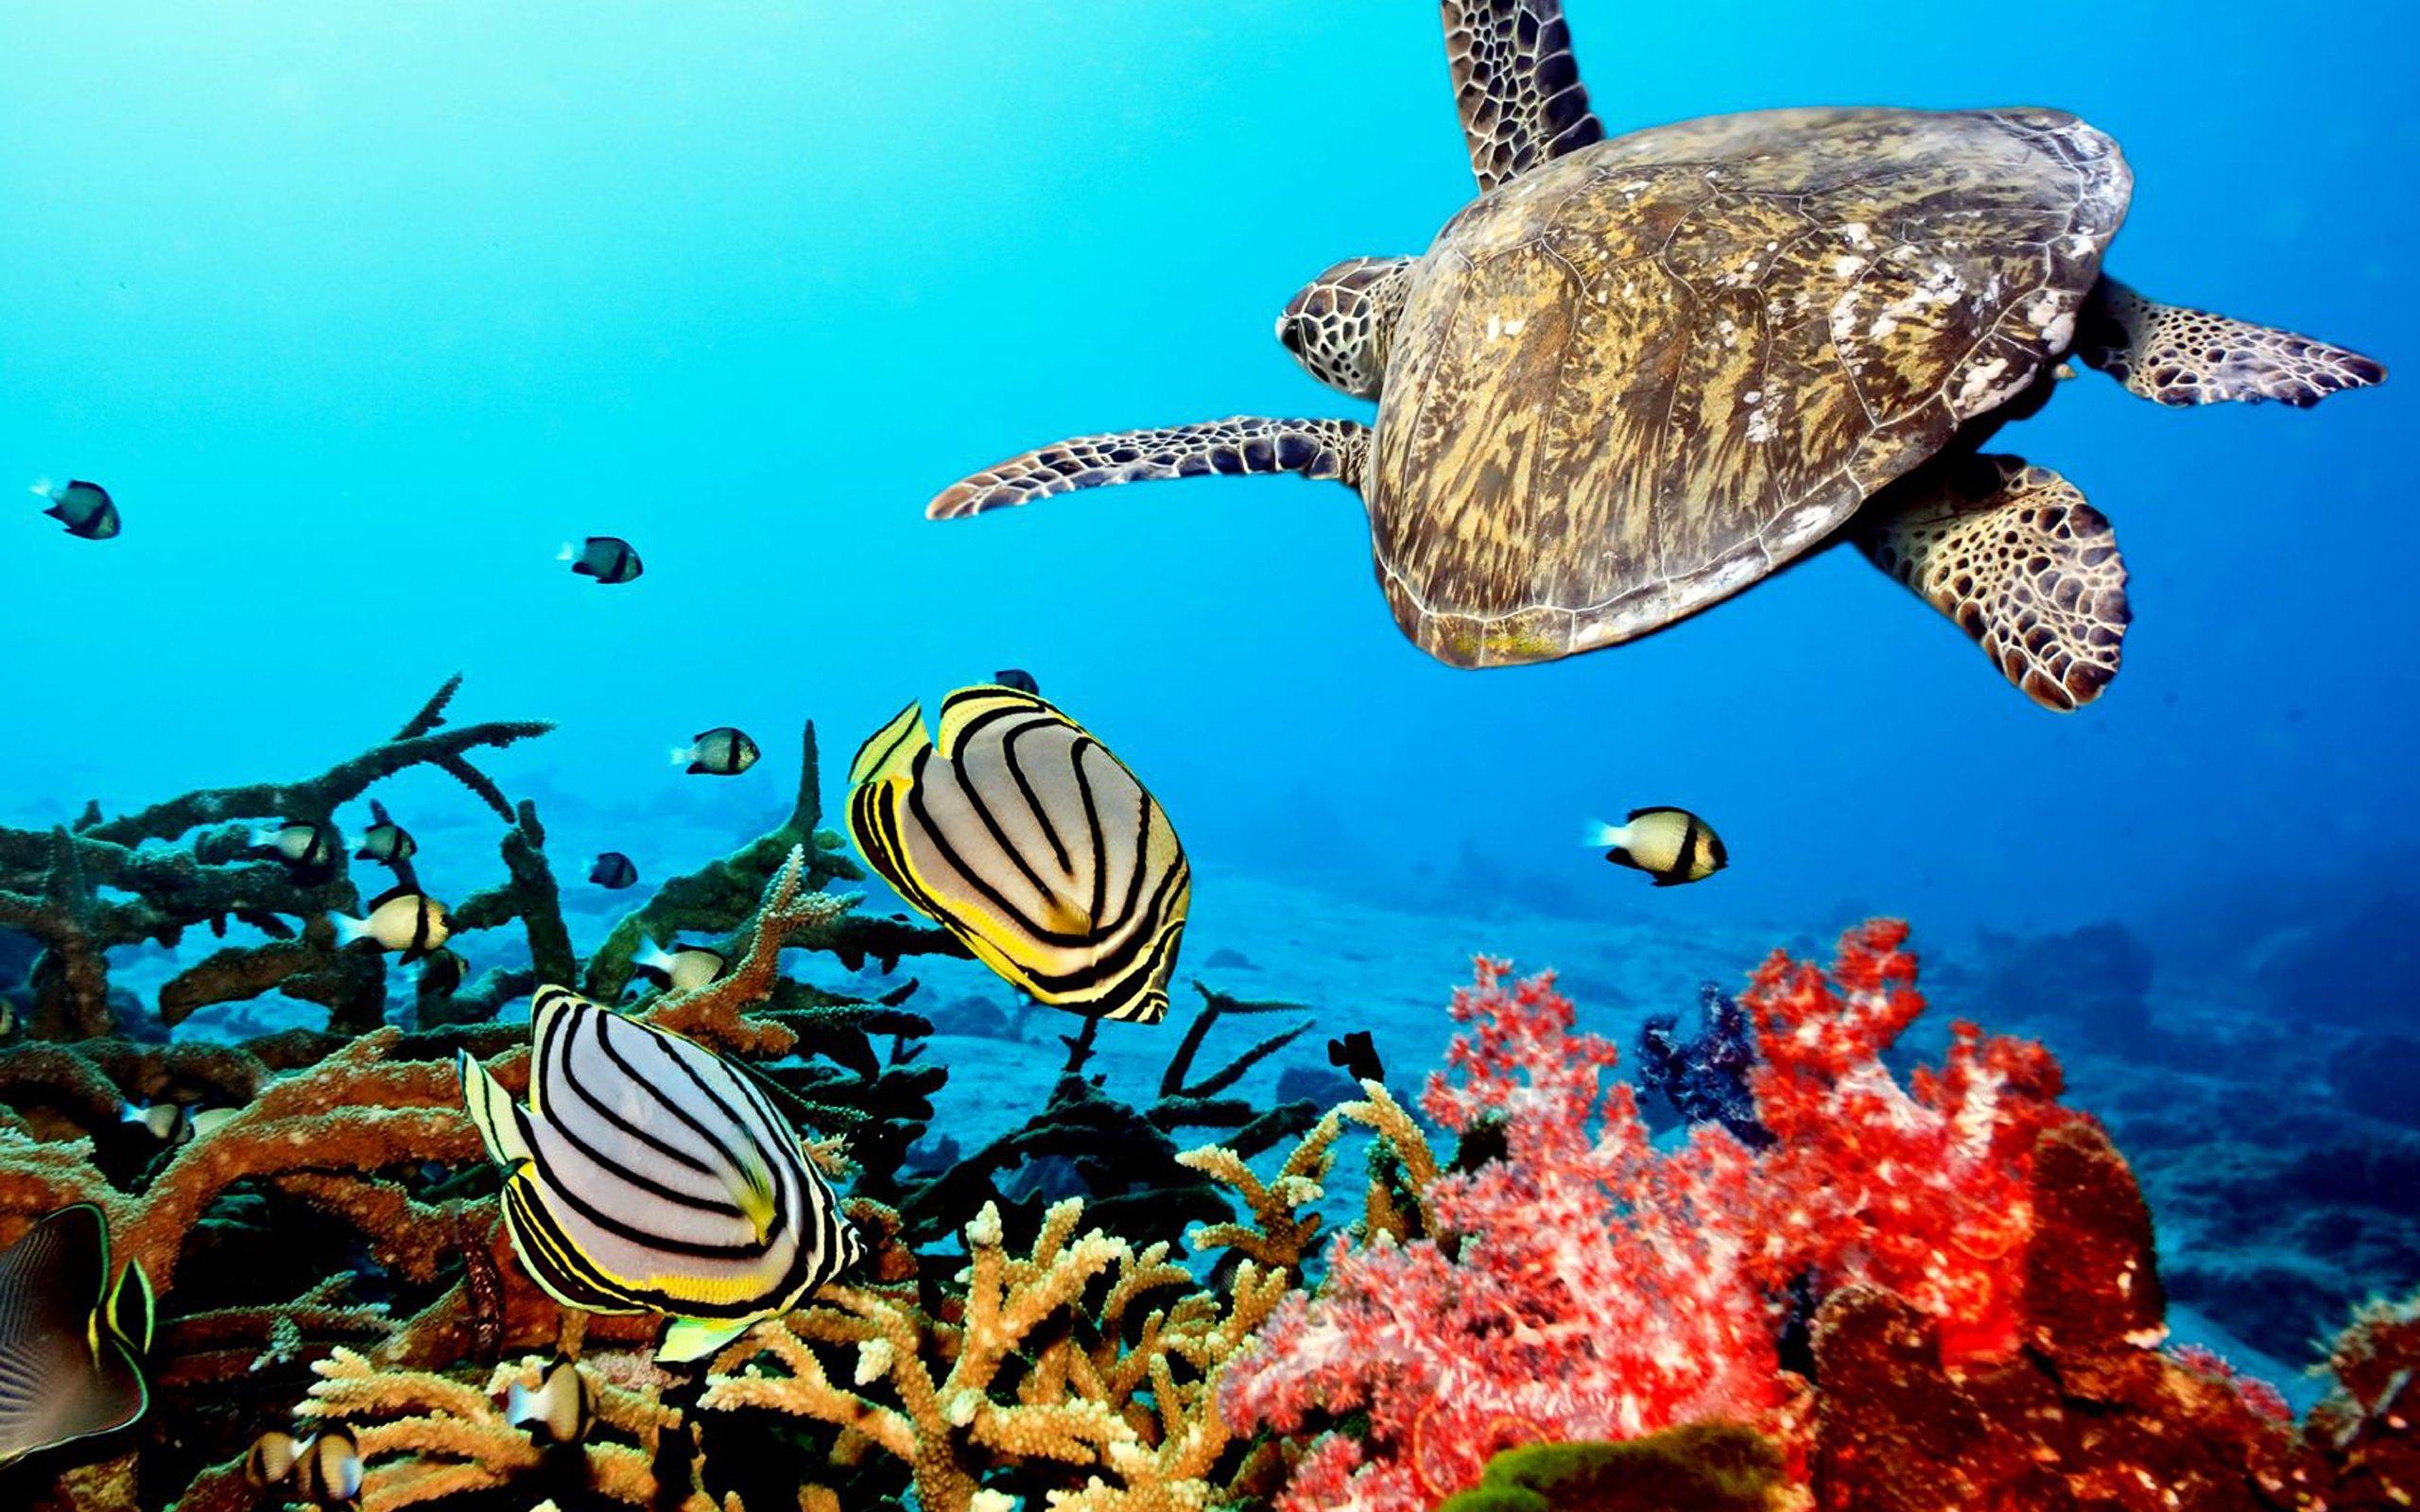 0933f0cb4ee0a4a - Мальдивы. Открытие JW Marriott Maldives Resort & Spa